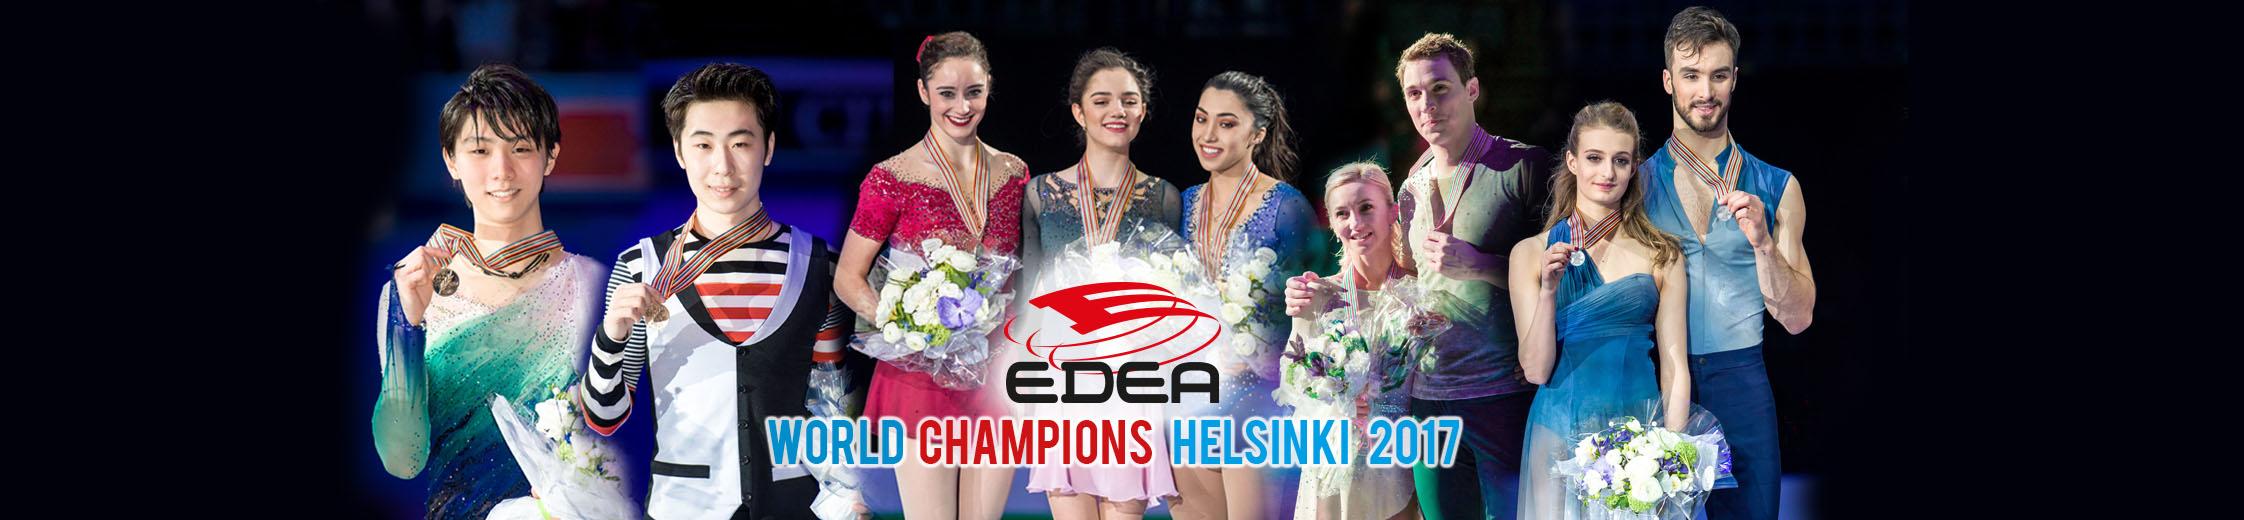 slide_podio_helsinki